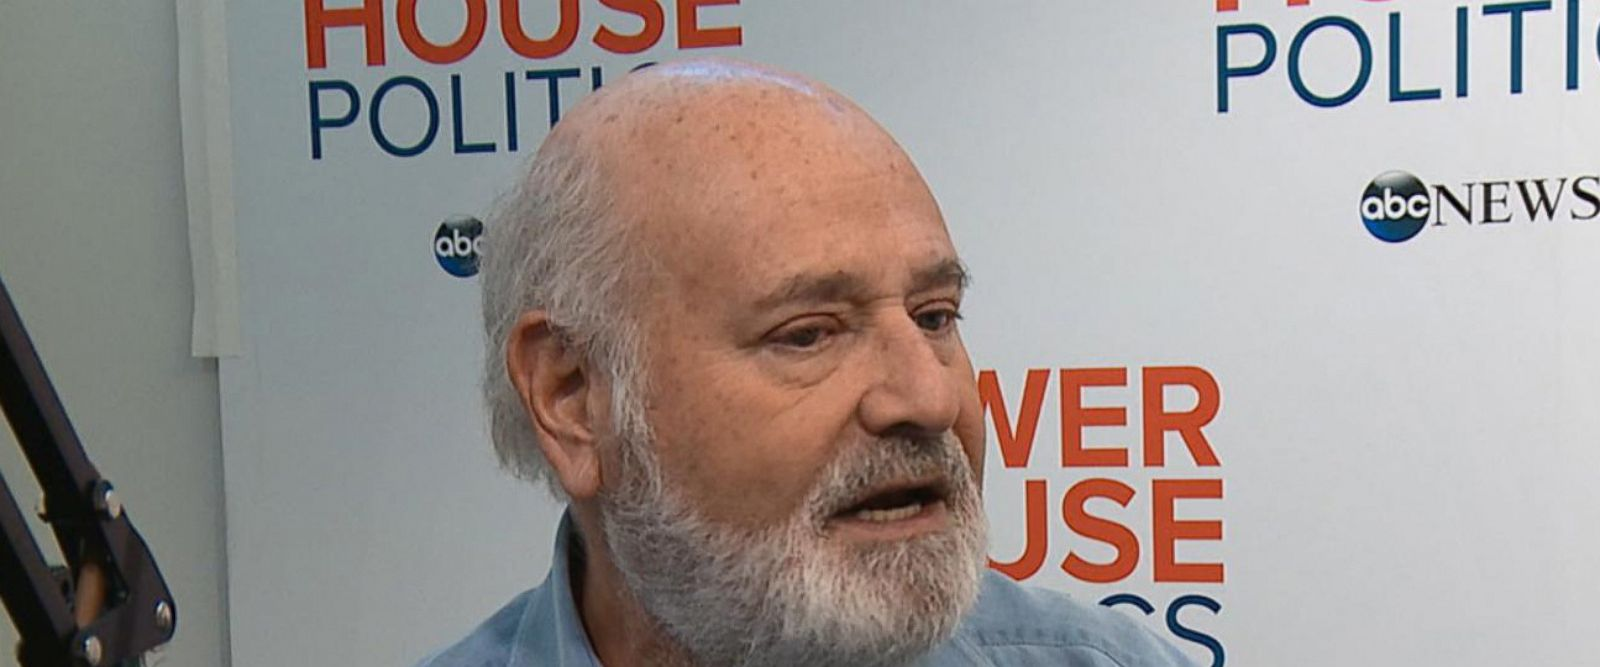 VIDEO: Powerhouse Politics: Director Rob Reiner on his new film, 'LBJ'